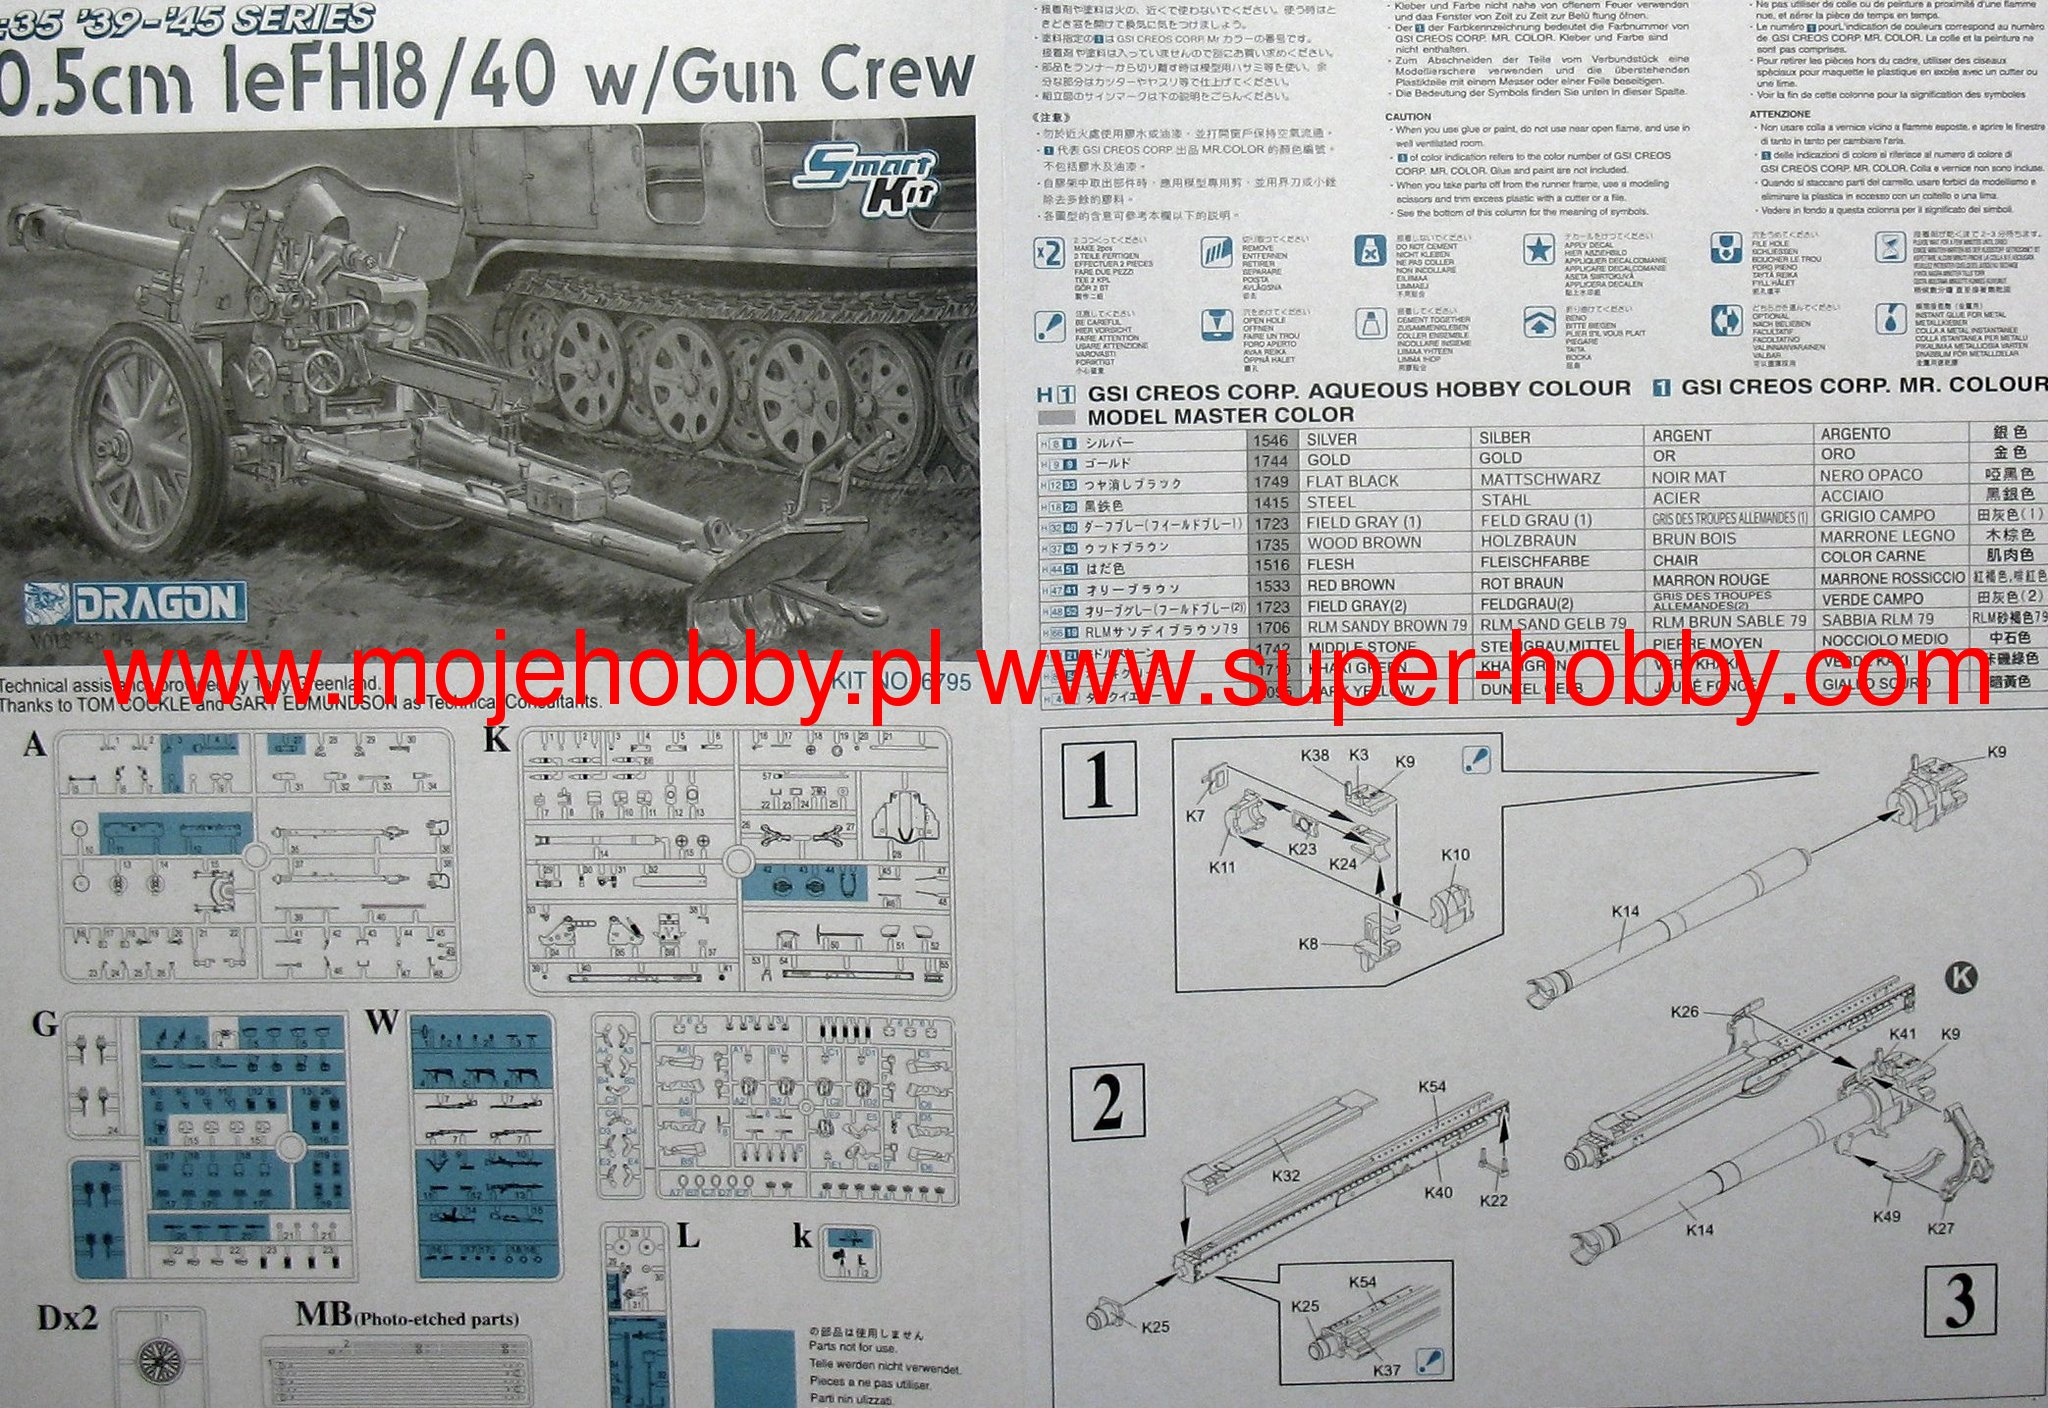 10 5cm leFH 18/40 w/Gun Crew